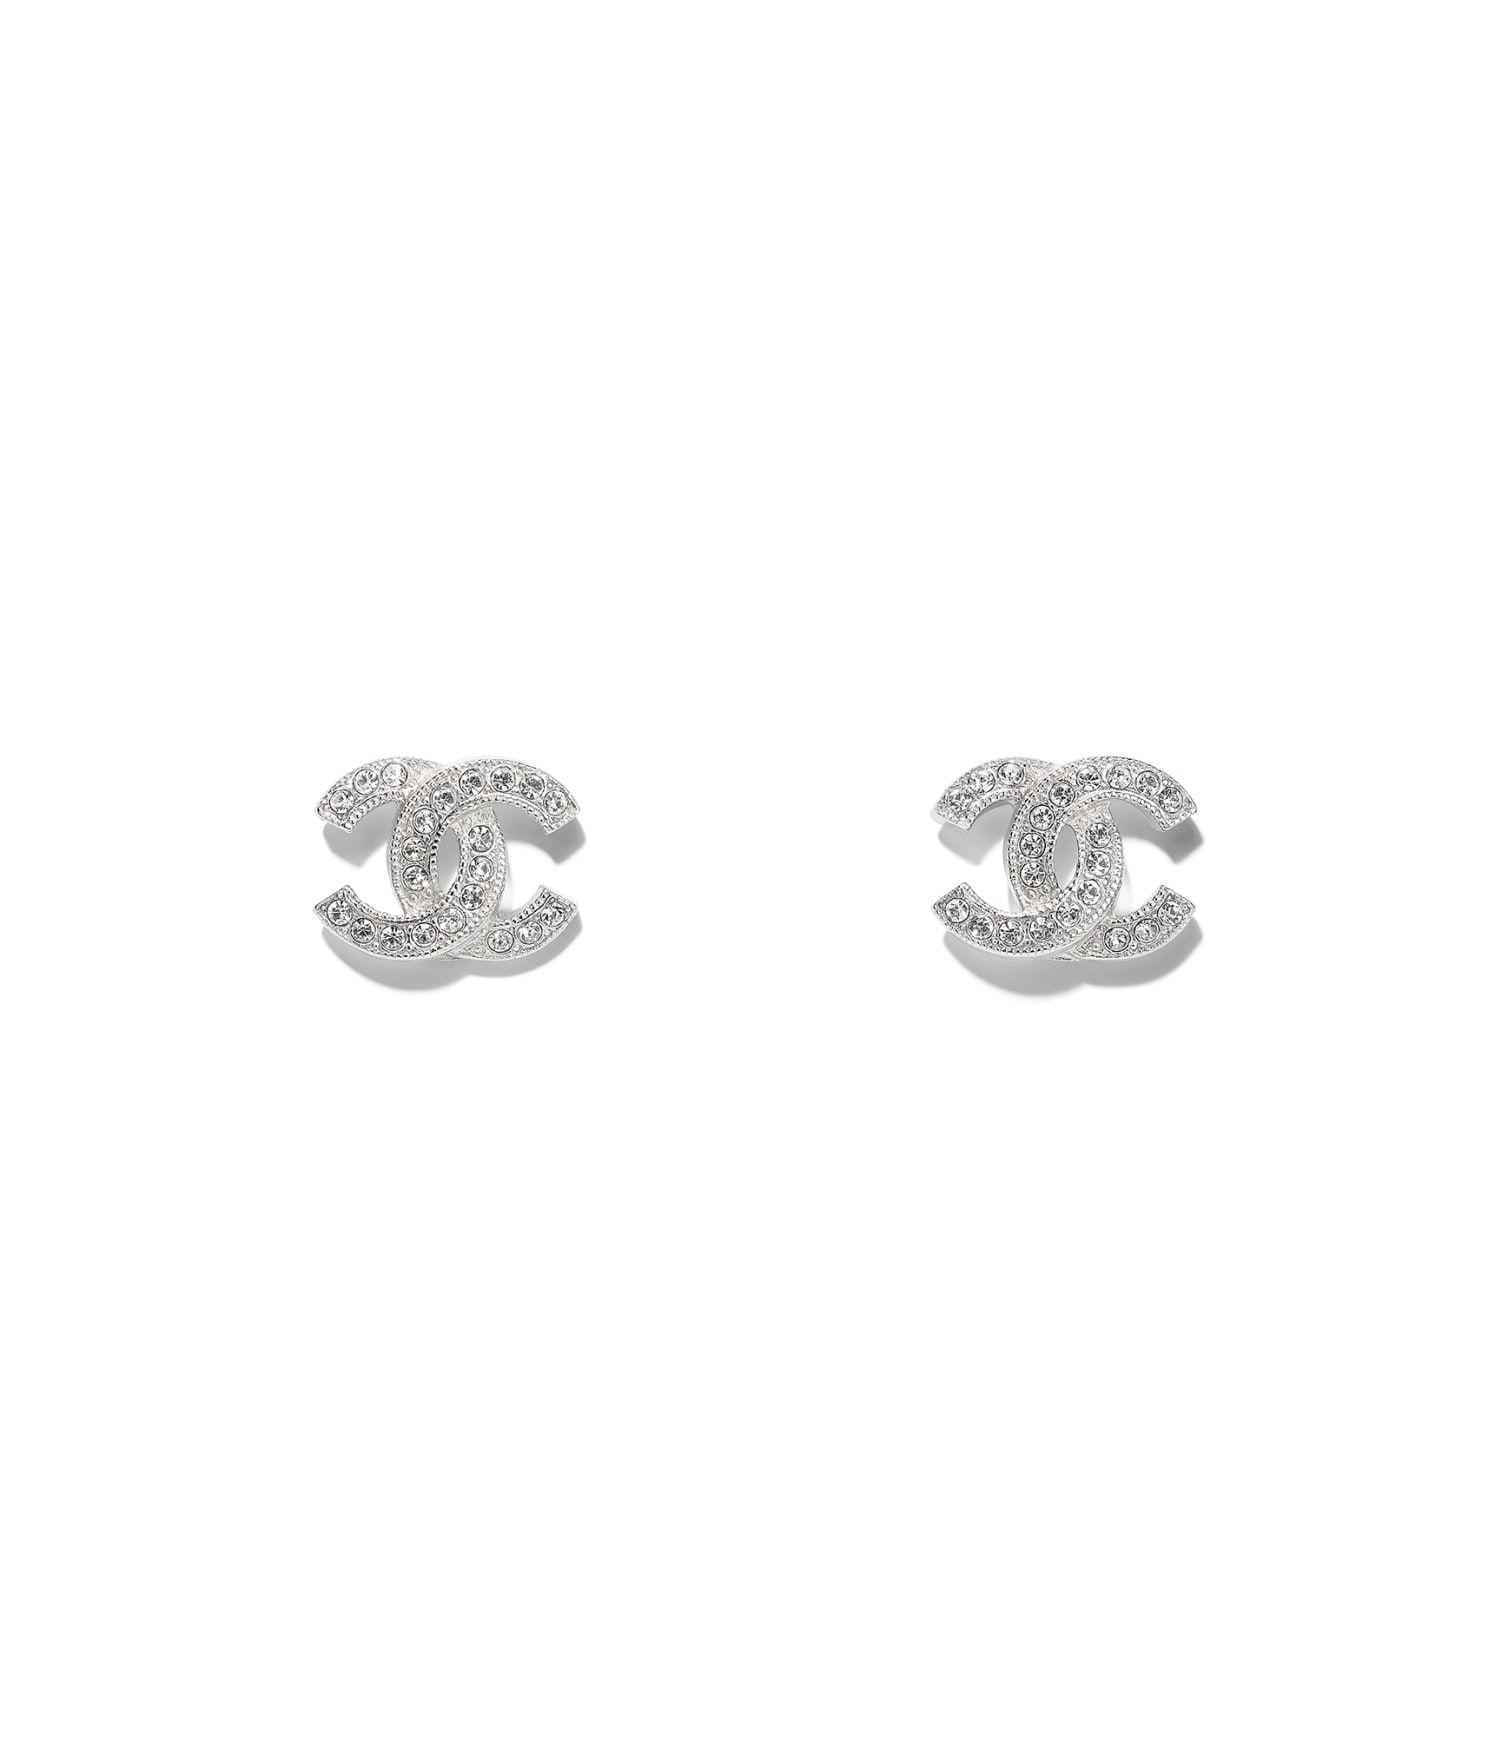 CHANEL 金屬水晶耳環(銀),建議售價 NT$12,800